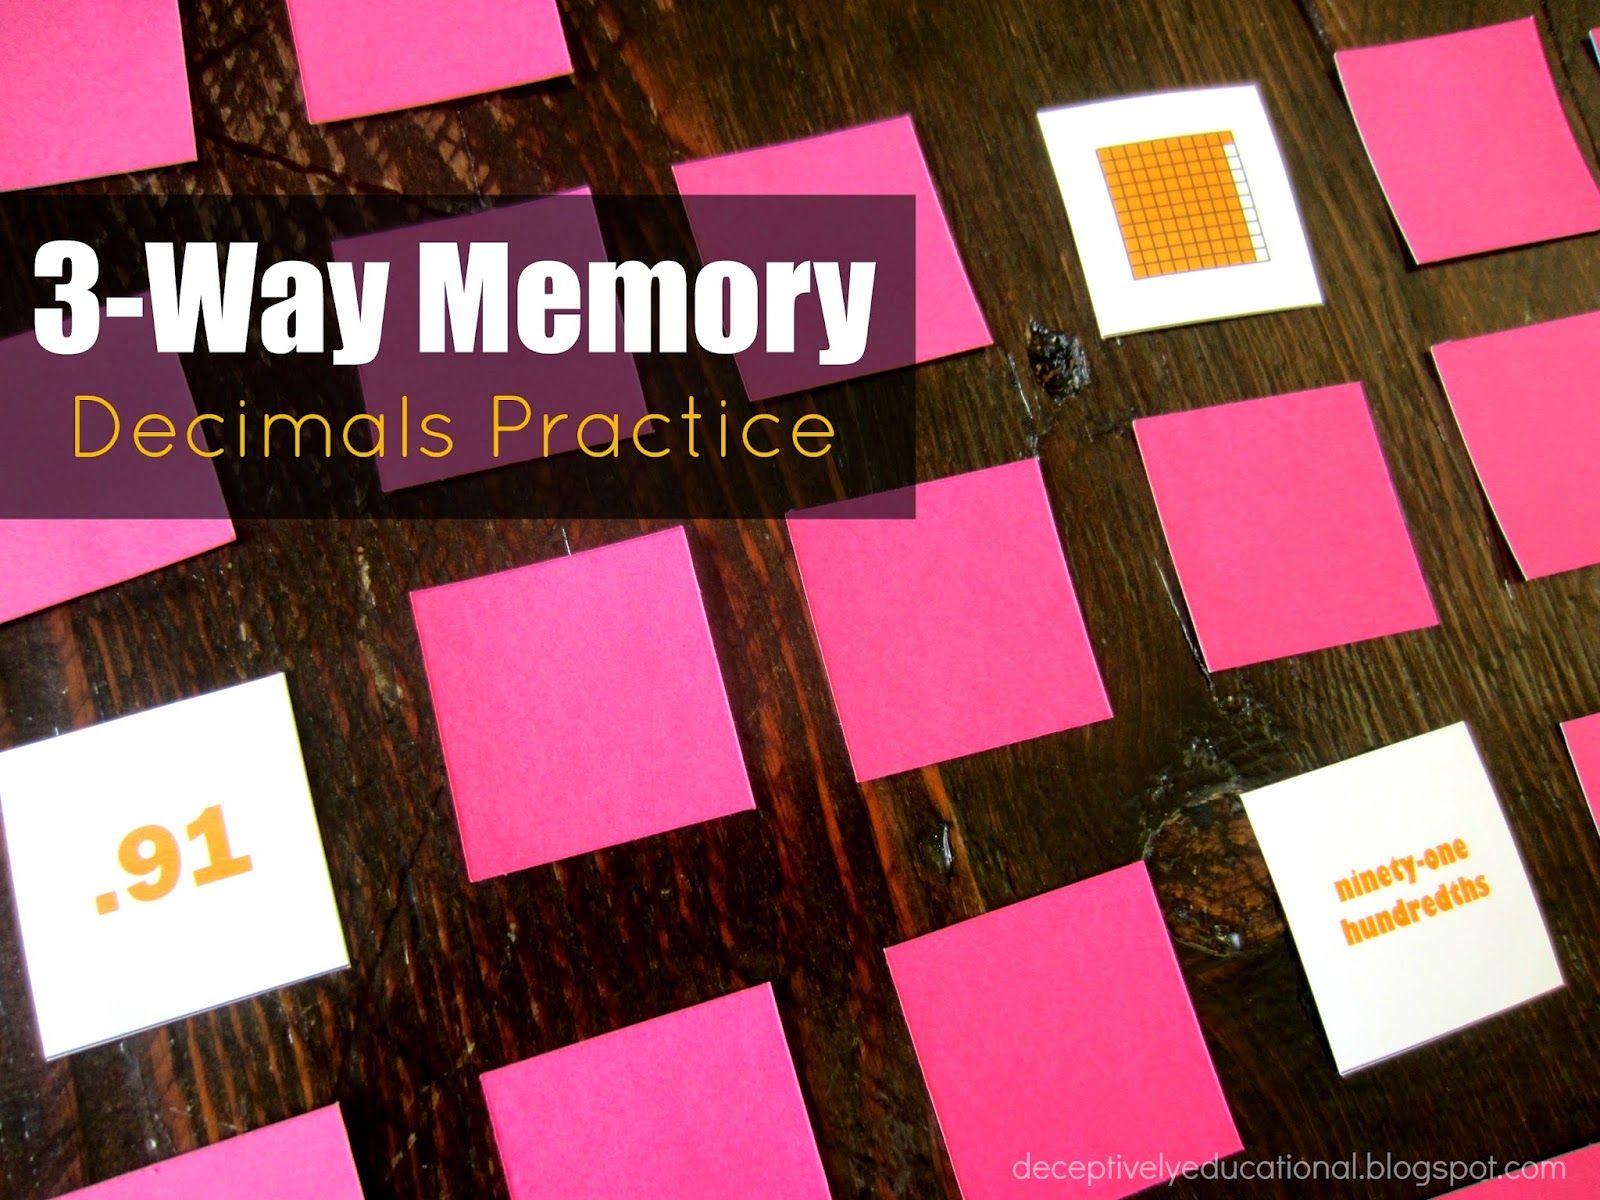 3 Way Memory Decimals Practice